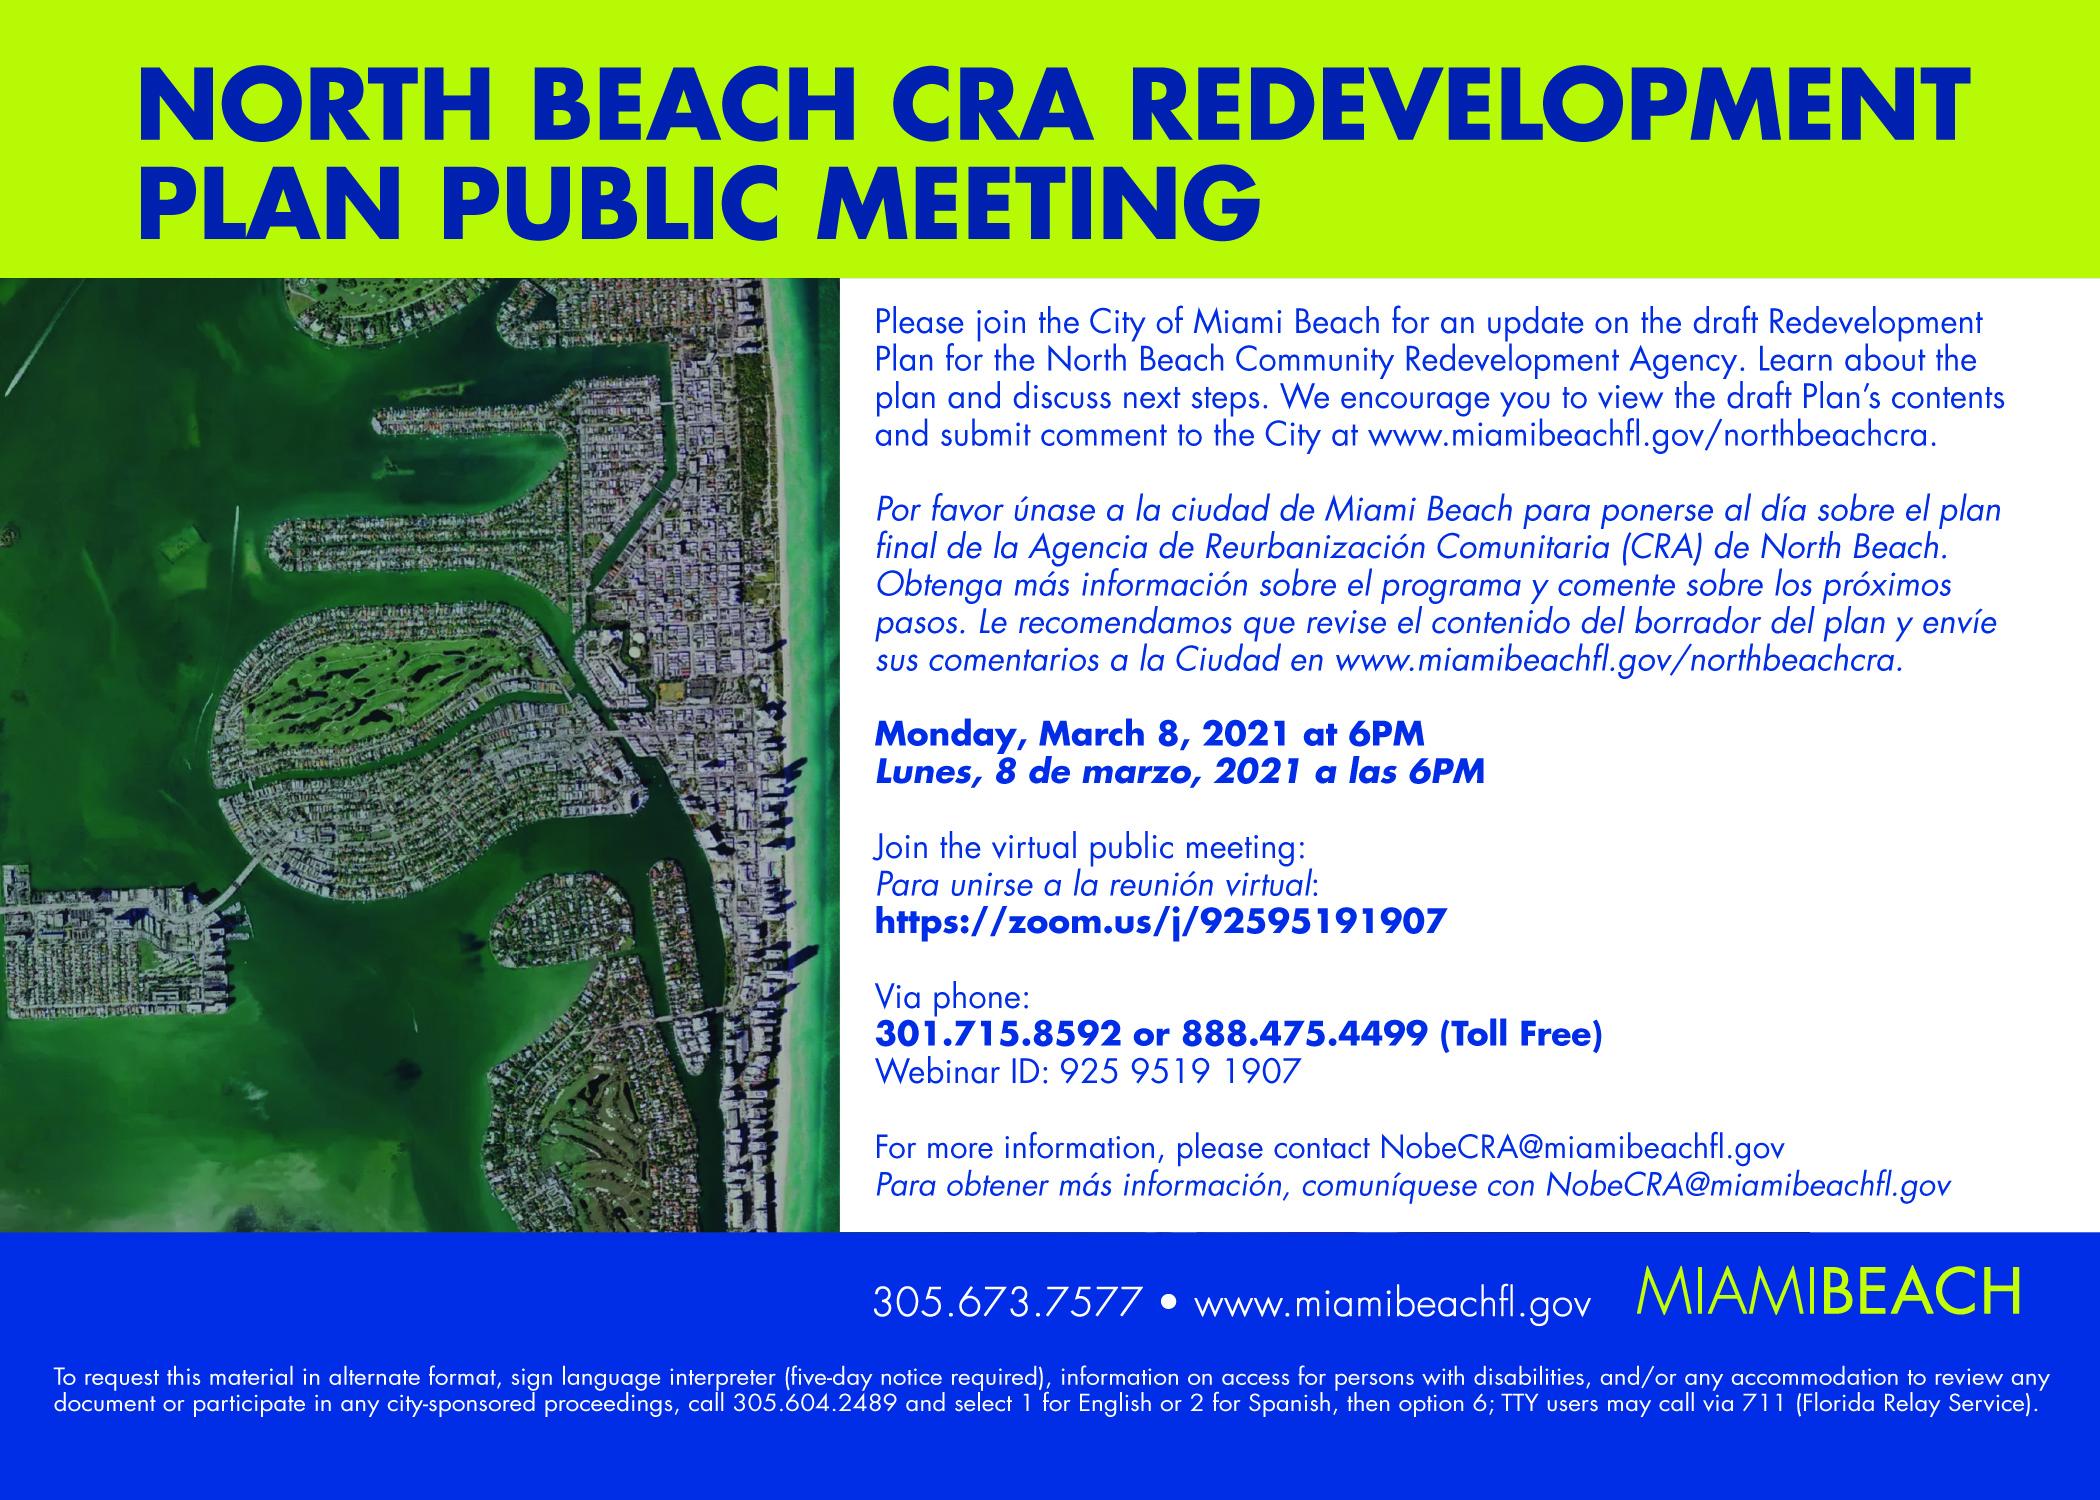 North Beach CRA Redevelopment Plan Public Meeting